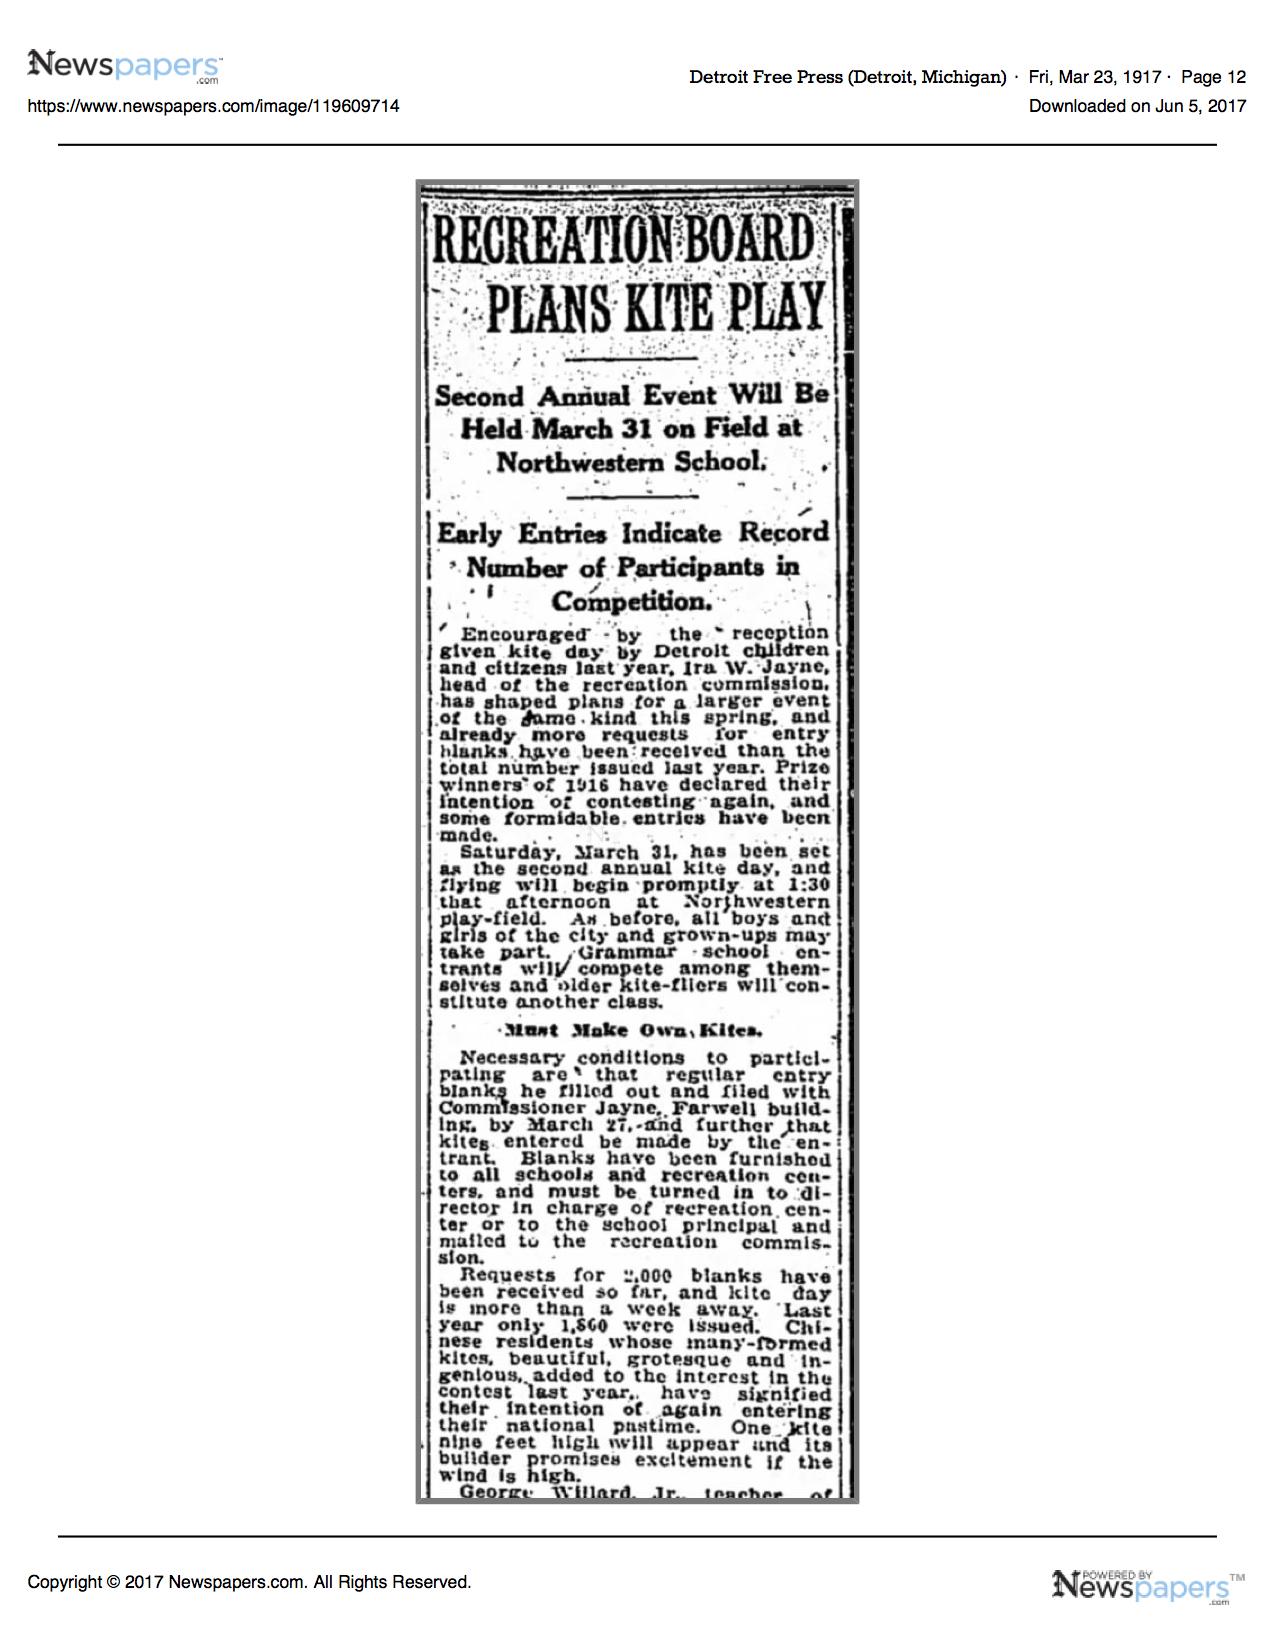 Detroit_Free_Press_Fri__Mar_23__1917_.jpg